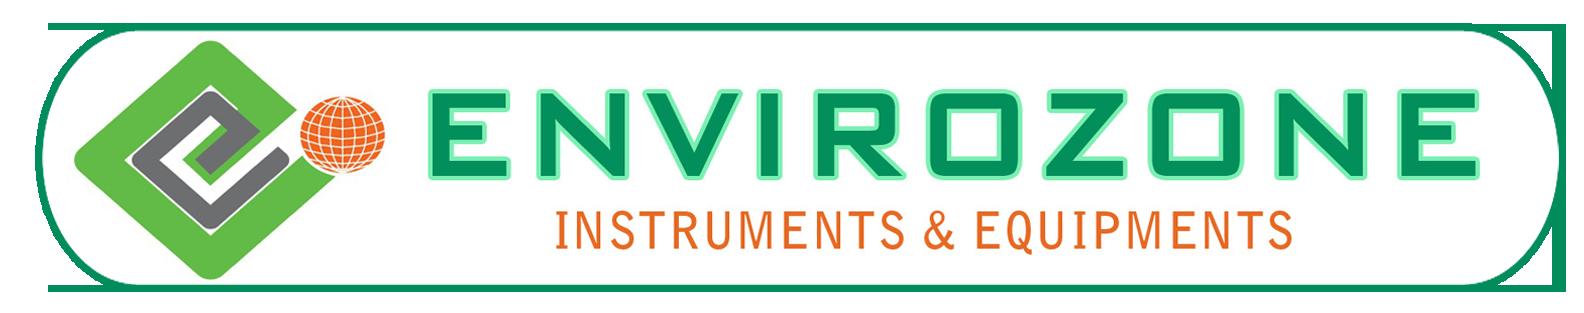 Envirozone  - Instrument and Equipment